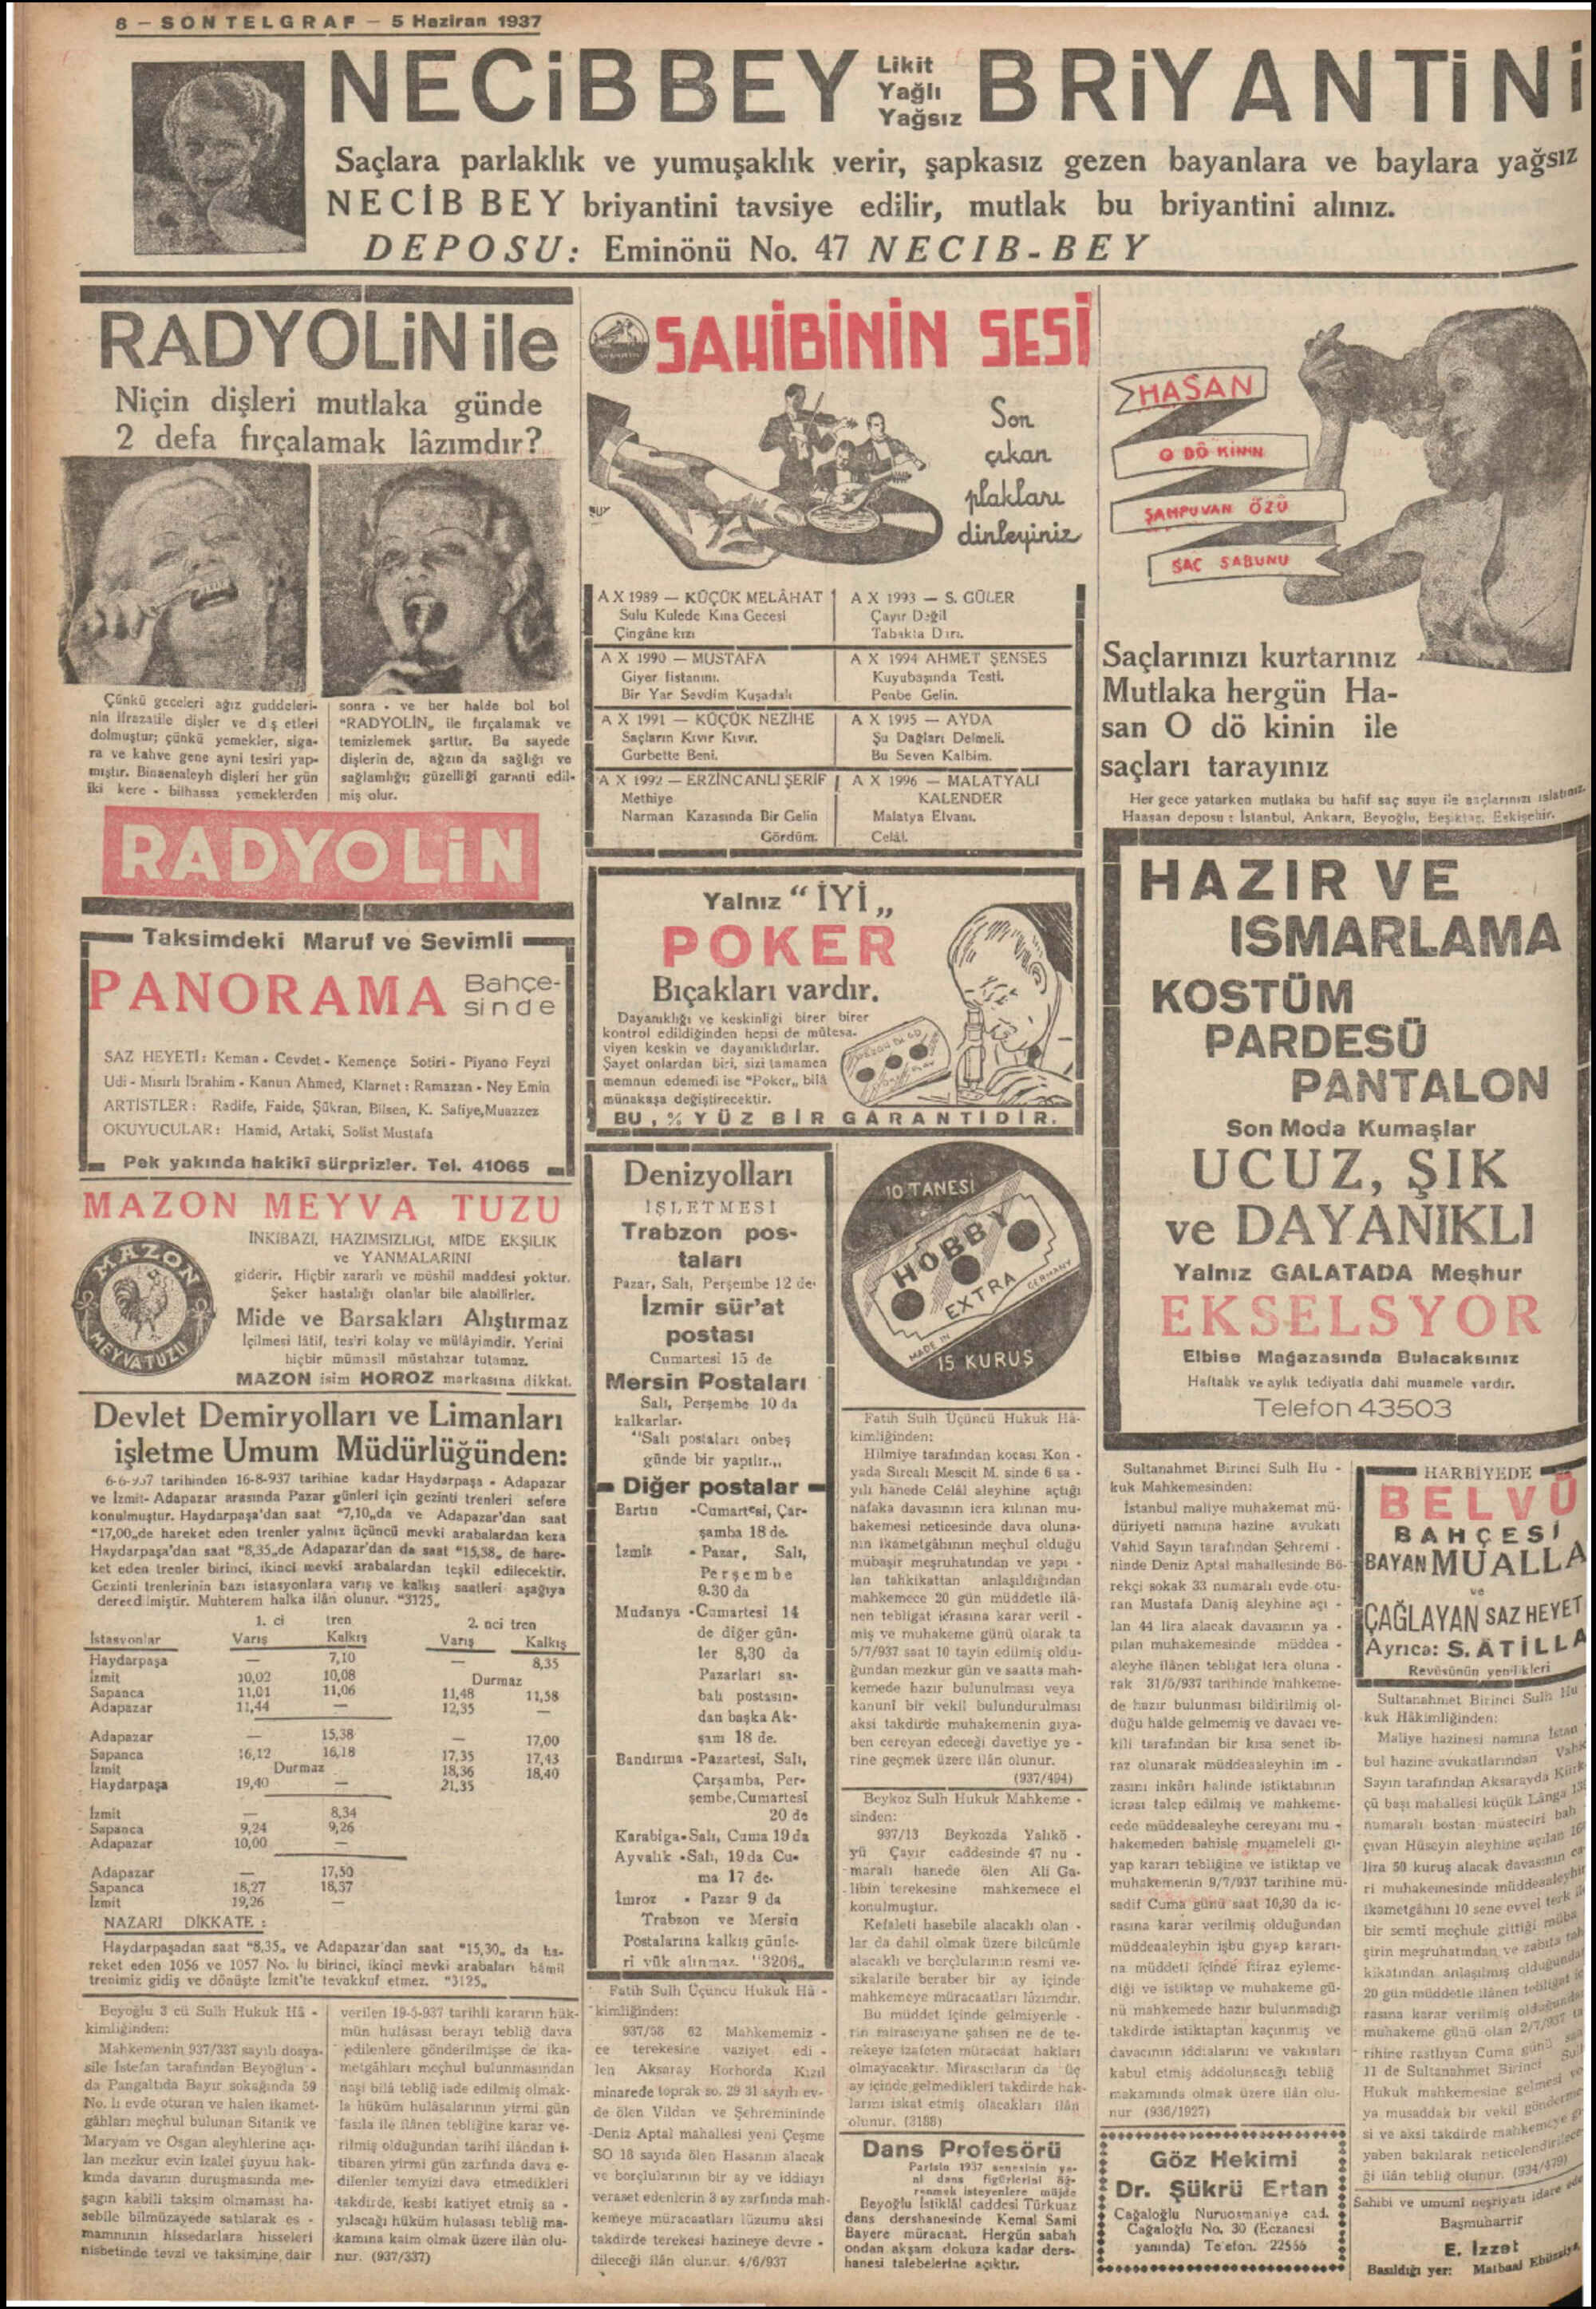 5 Haziran 1937 Tarihli Son Telgraf Gazetesi Sayfa 8